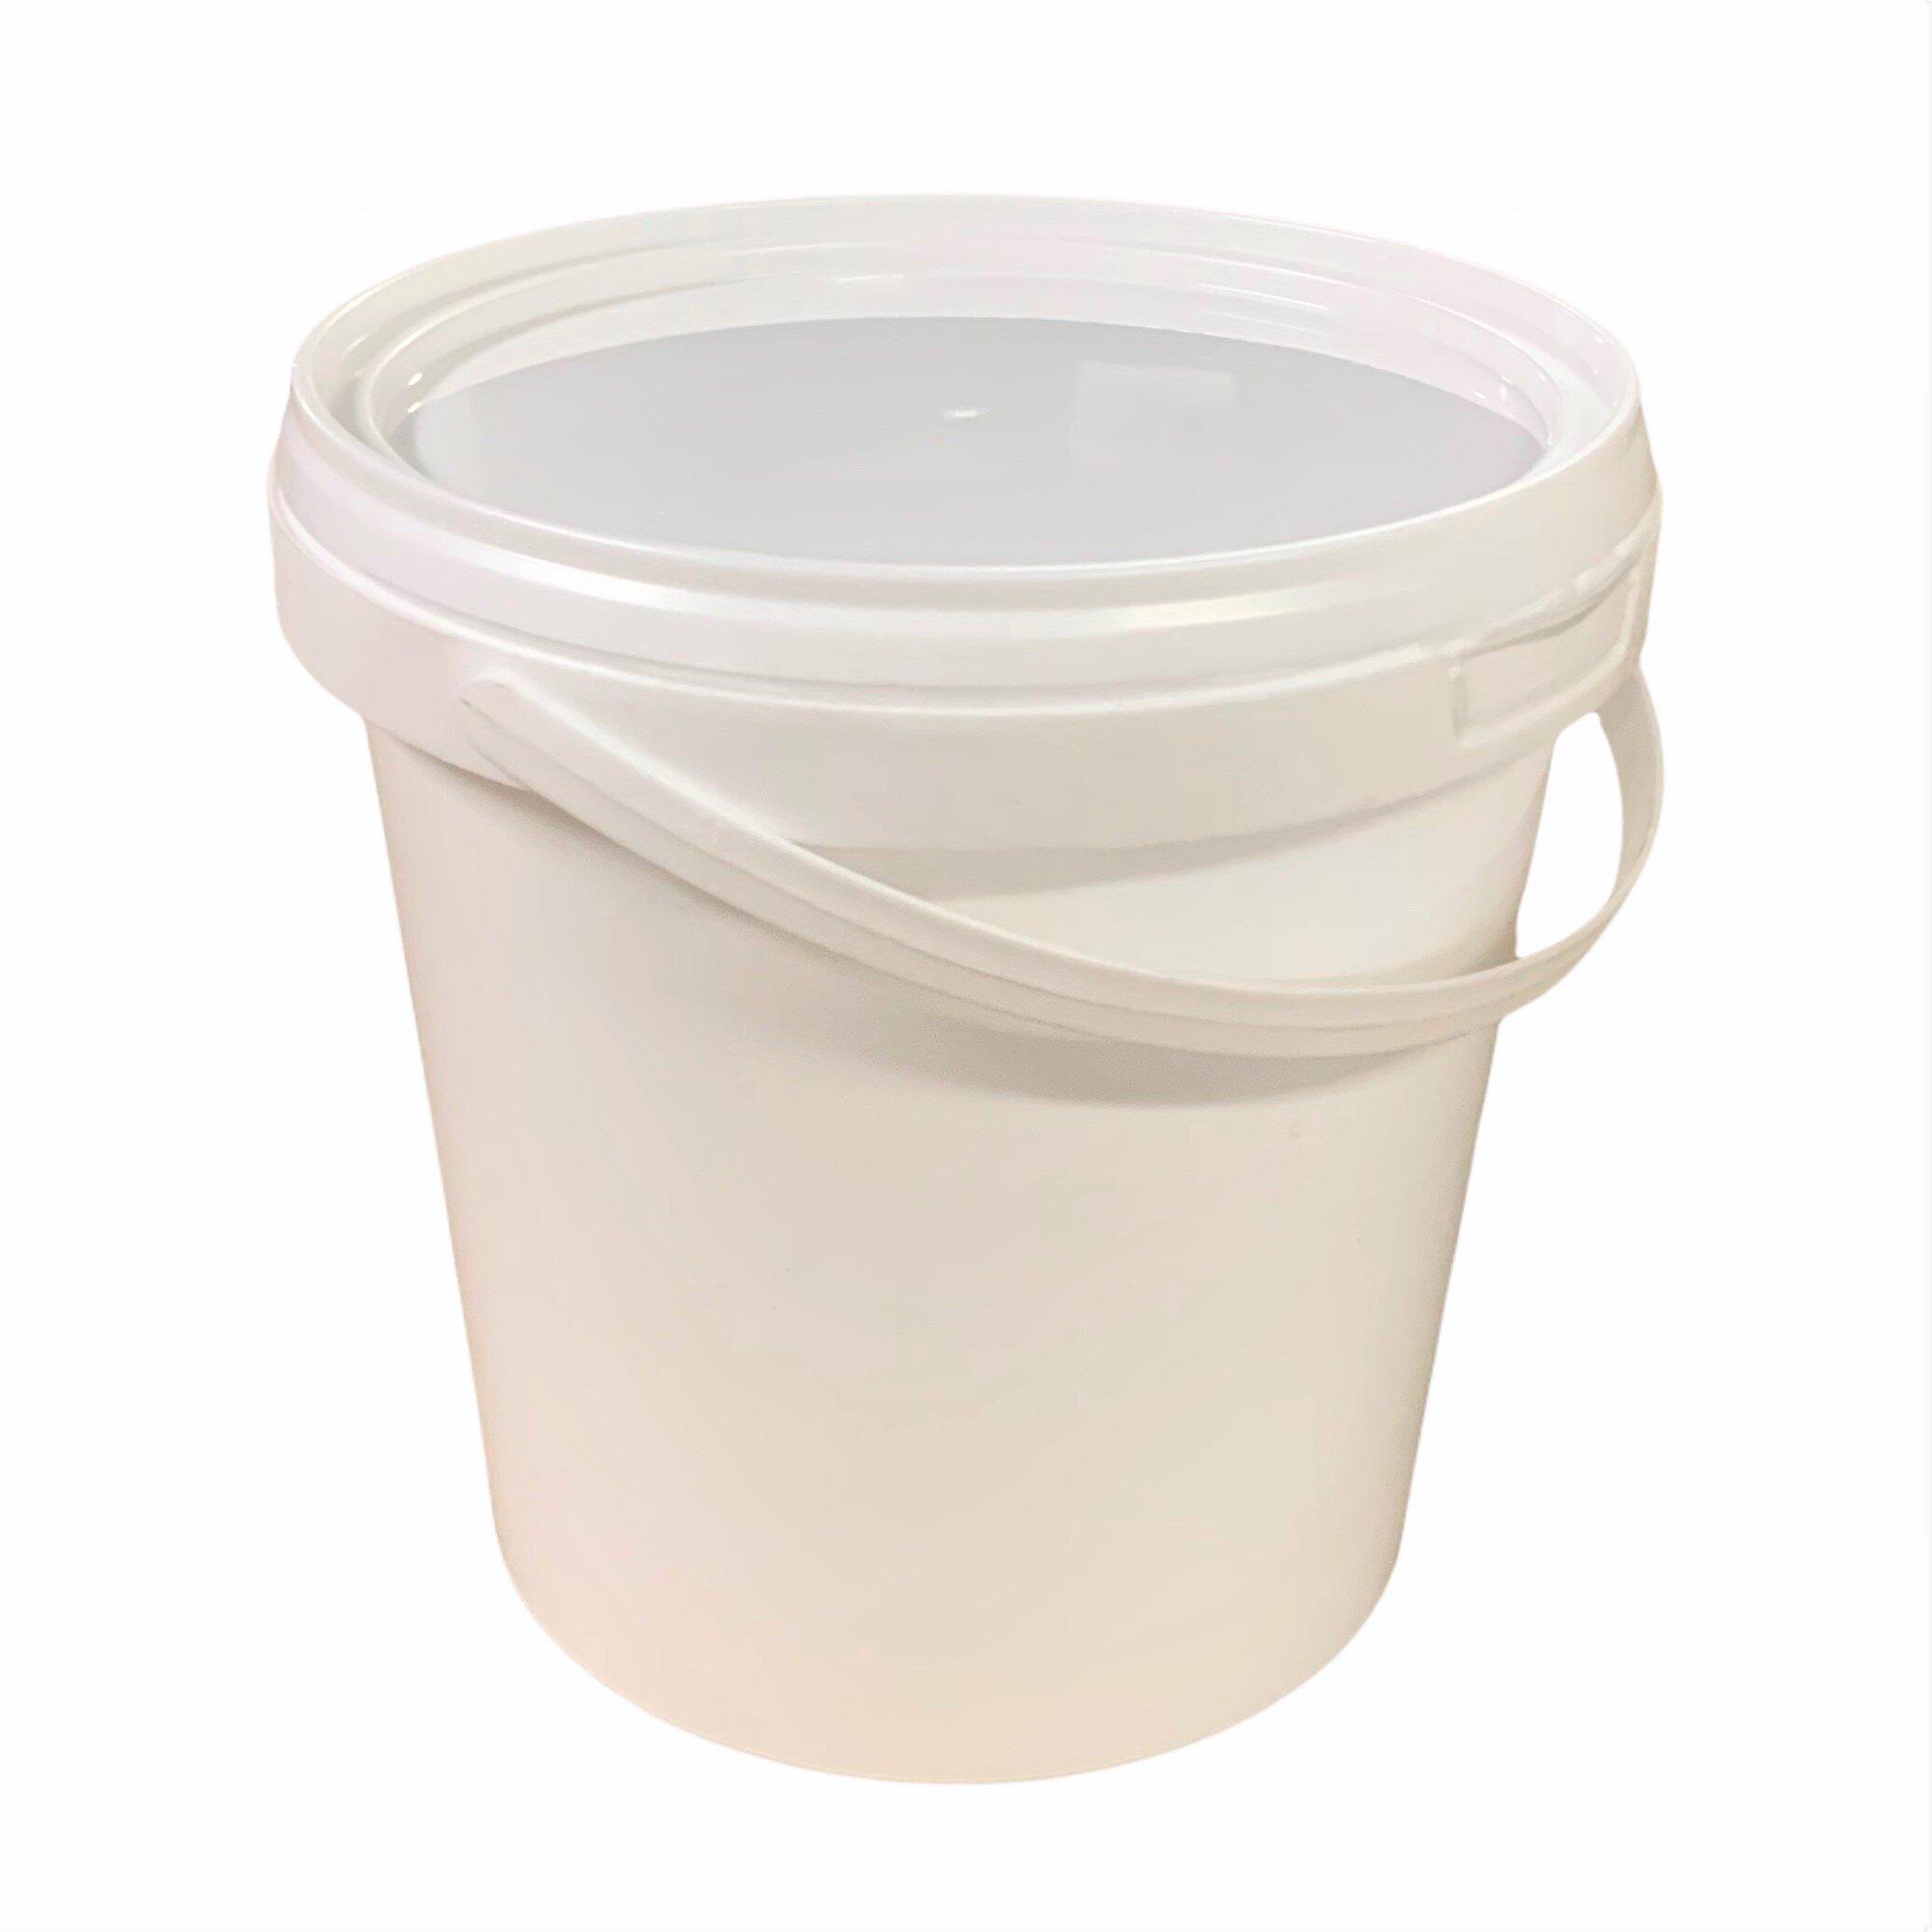 1 Litre Plastic buckets